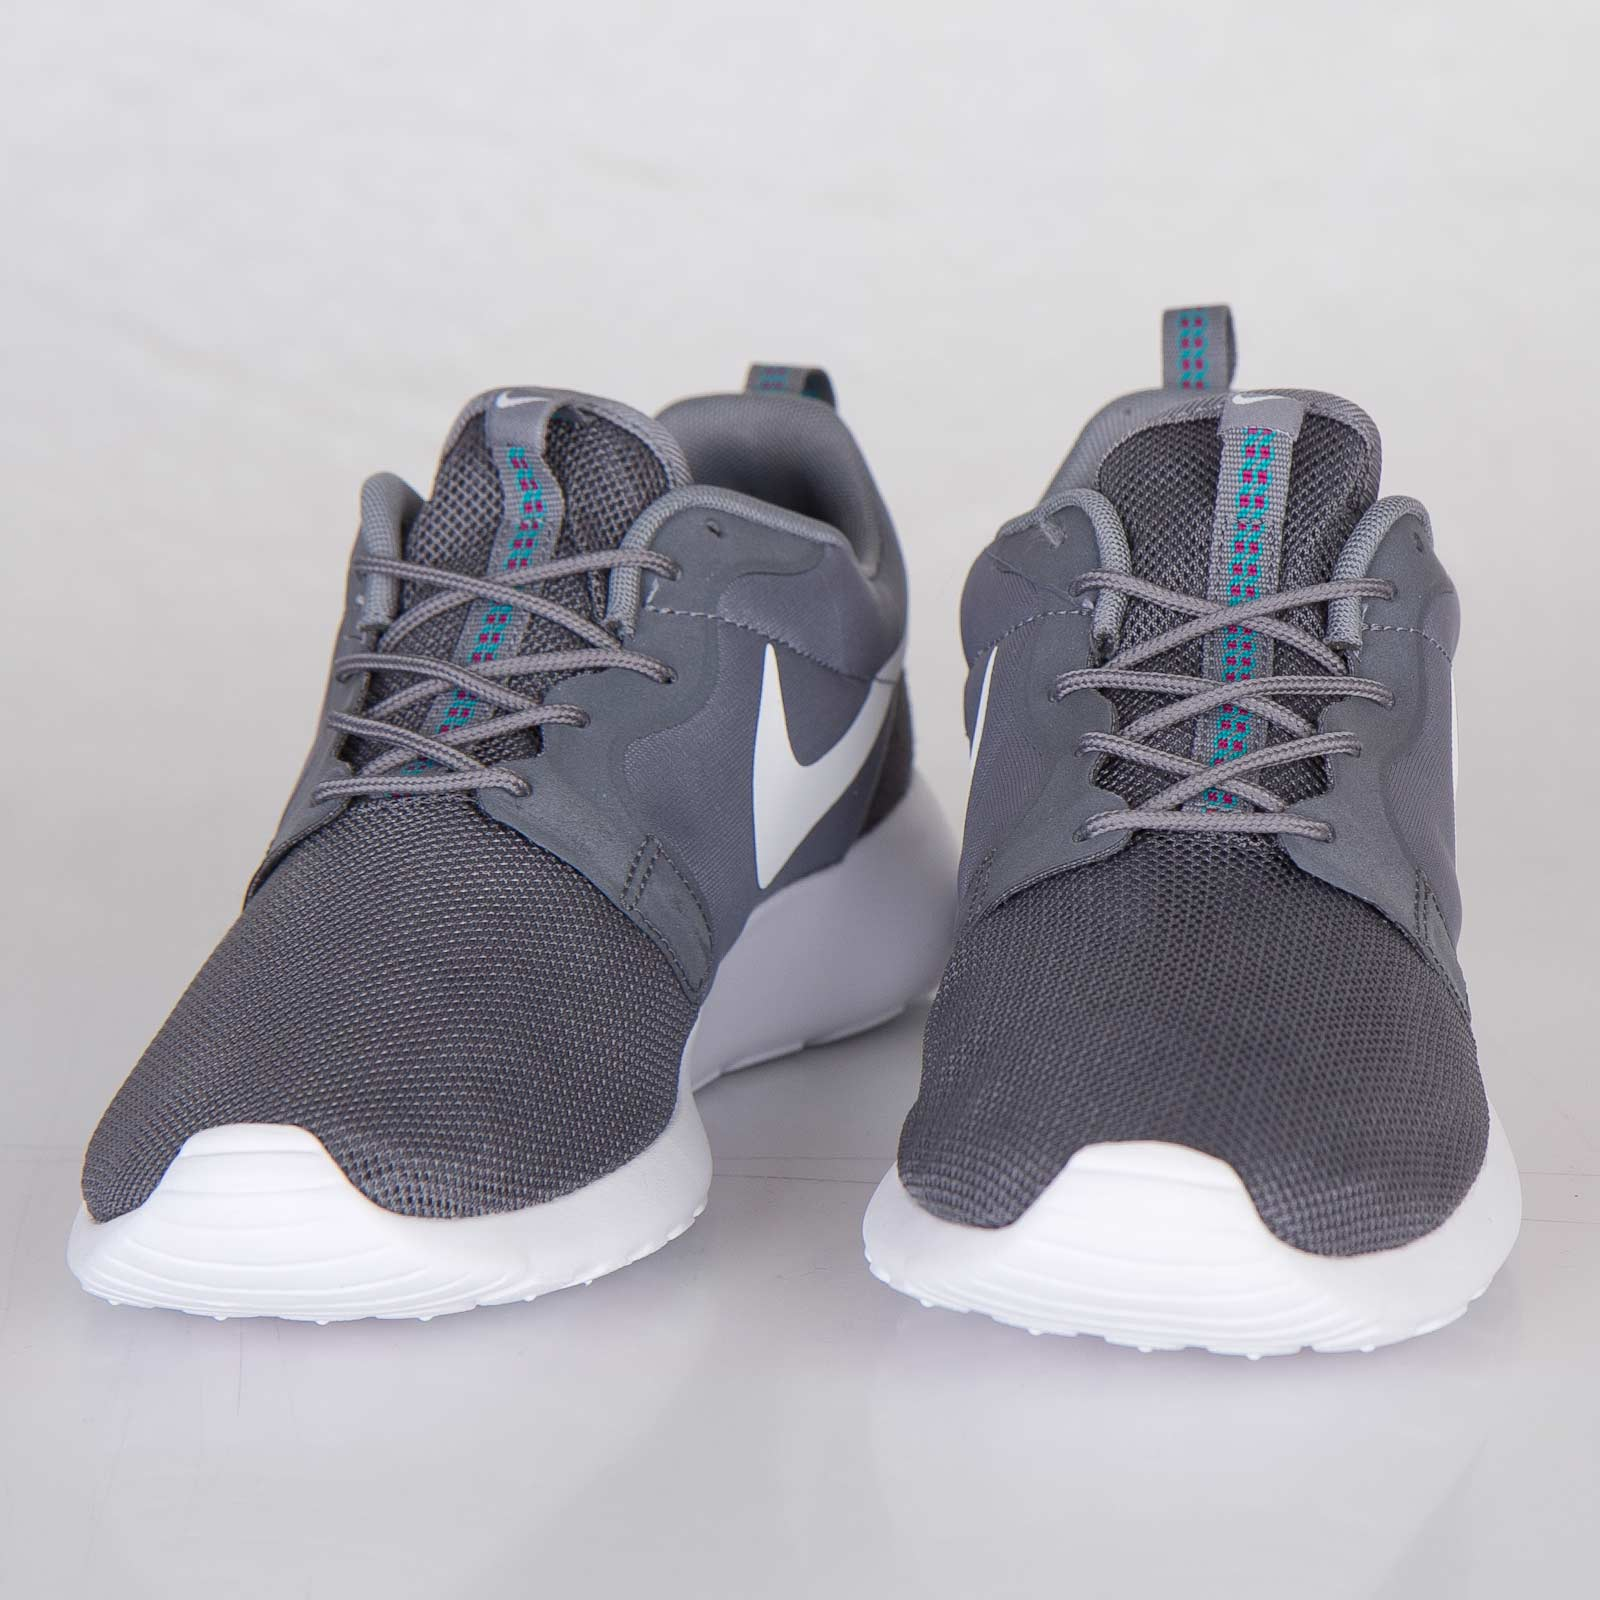 best authentic 6dfc6 7a7a3 Nike Roshe Run Hyperfuse - 636220-001 - Sneakersnstuff   sneakers    streetwear online since 1999